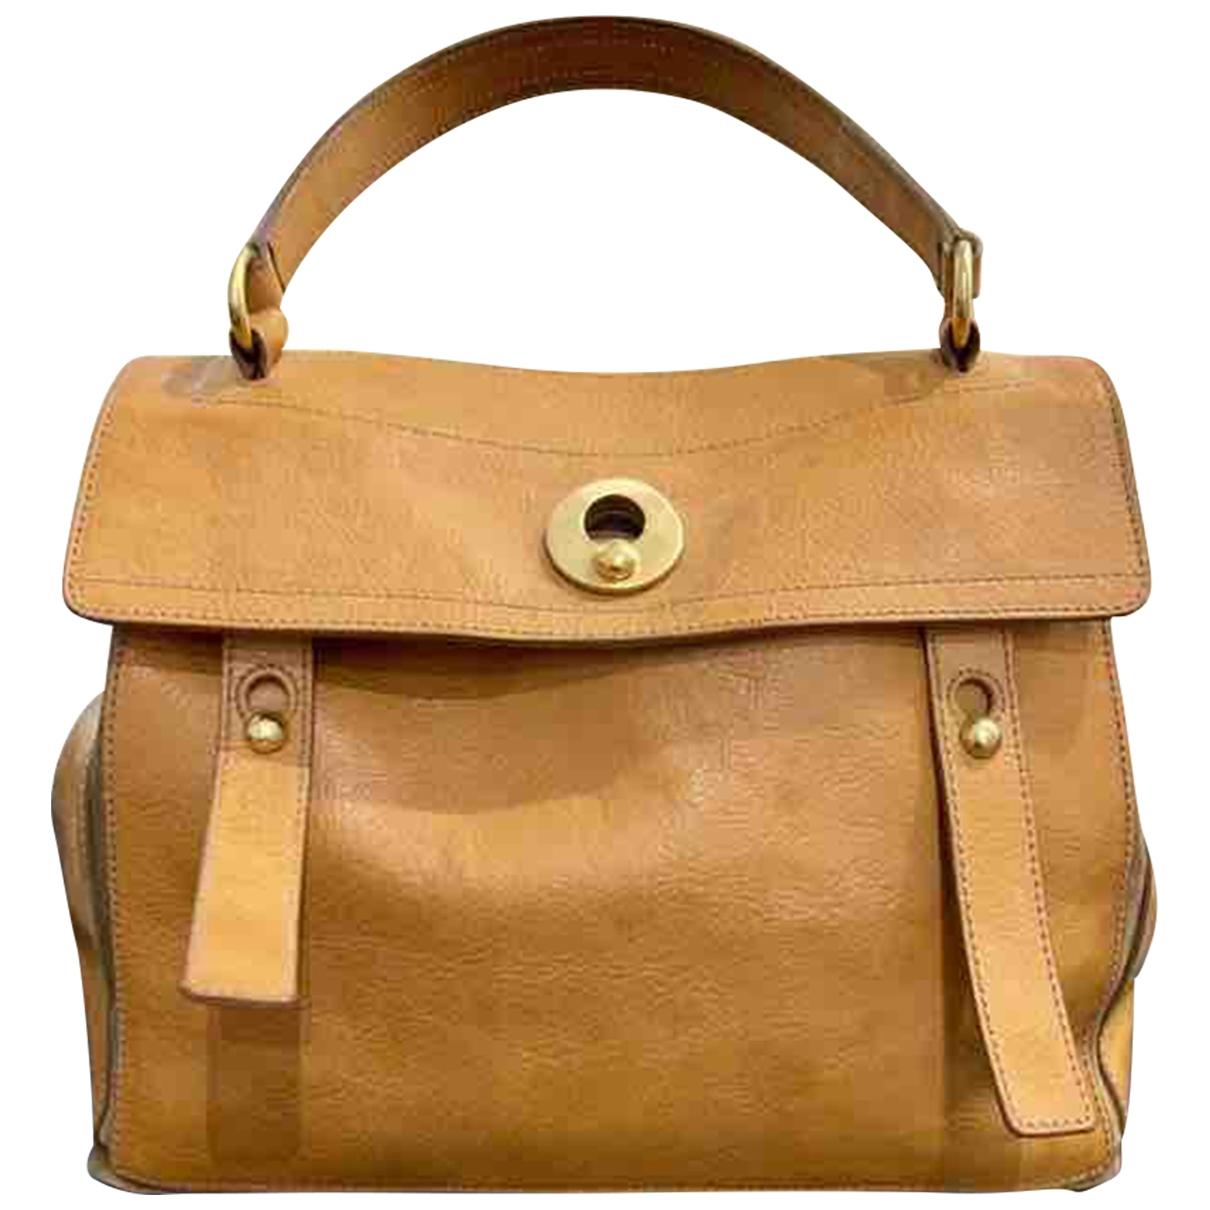 Yves Saint Laurent Muse Two Handtasche in  Beige Leder